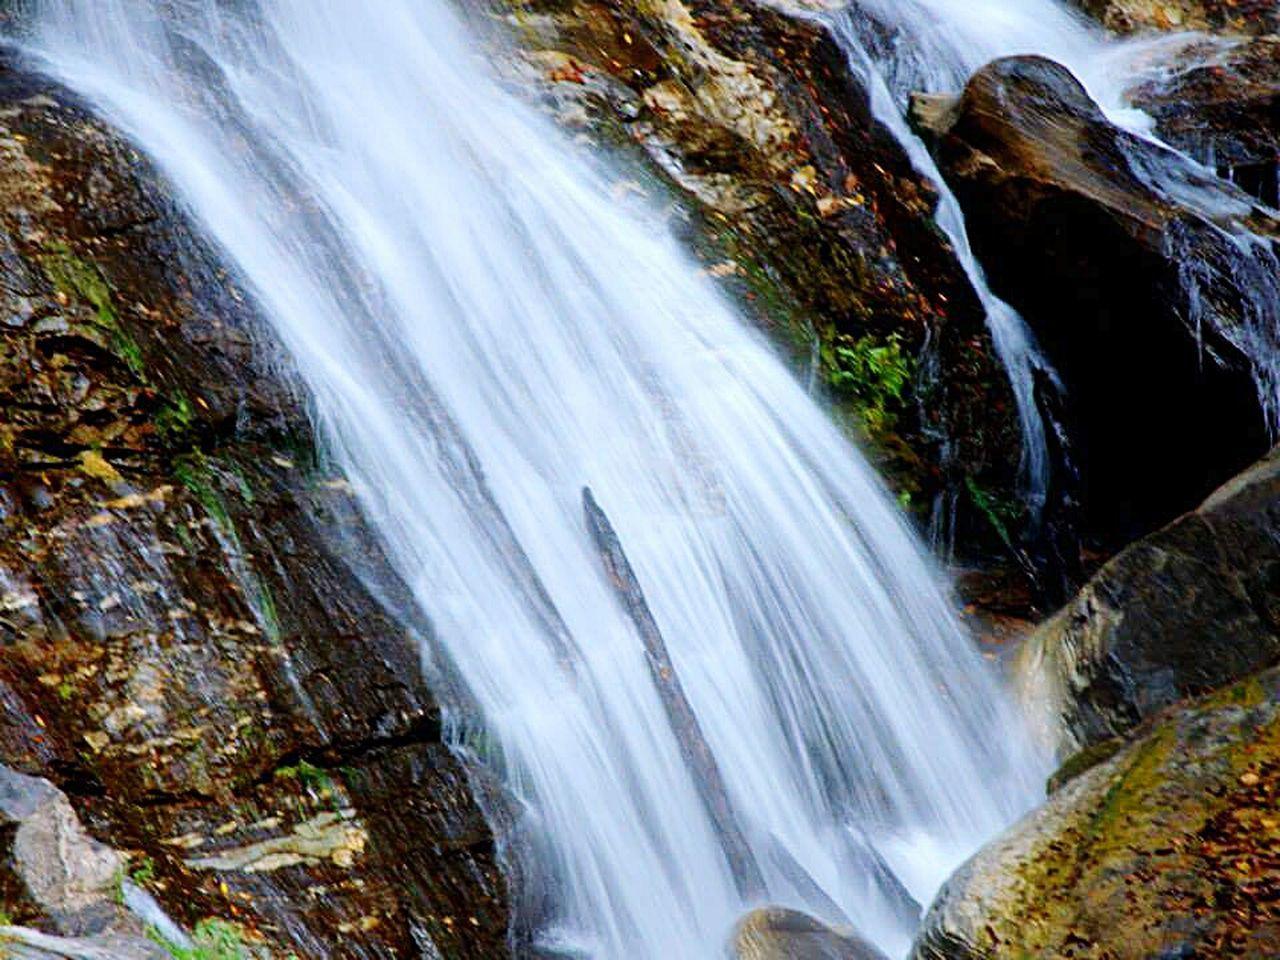 Waterfall Wachiratan